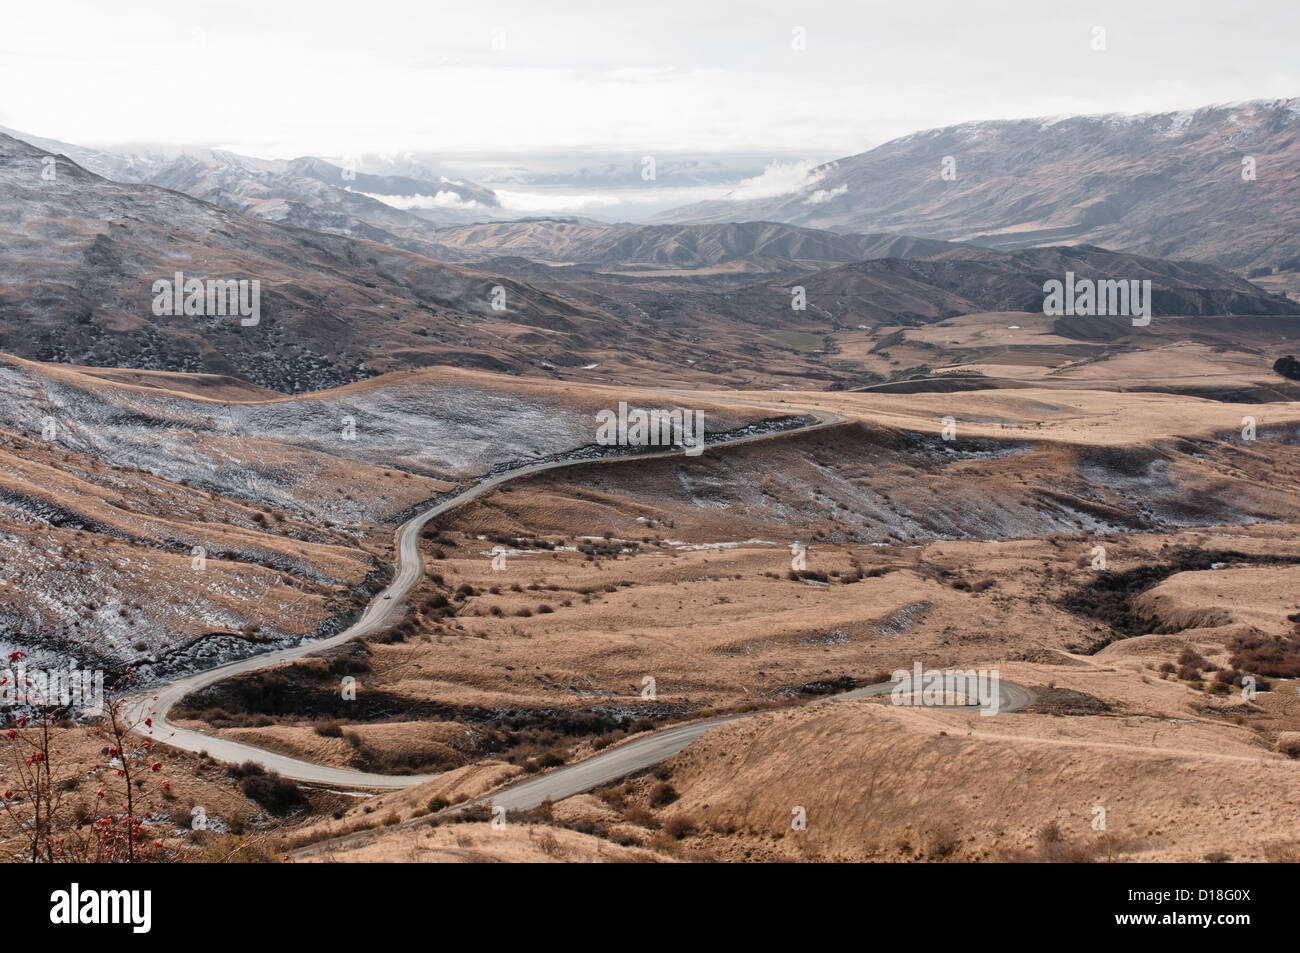 Curved road in rural landscape - Stock Image